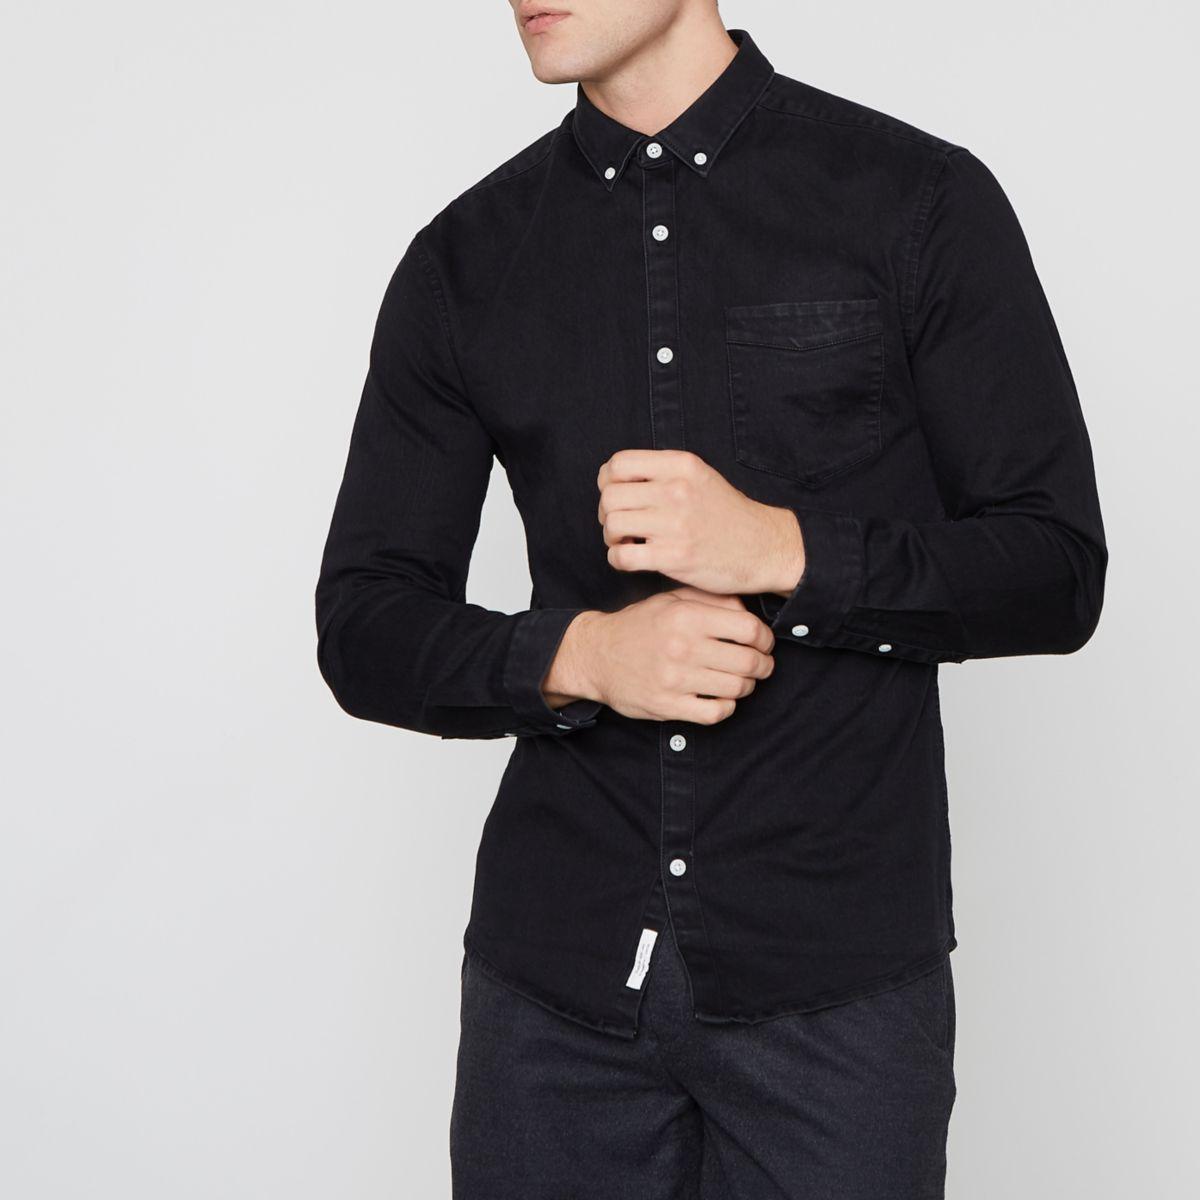 Black muscle fit button down denim shirt shirts sale men for Denim button down shirts